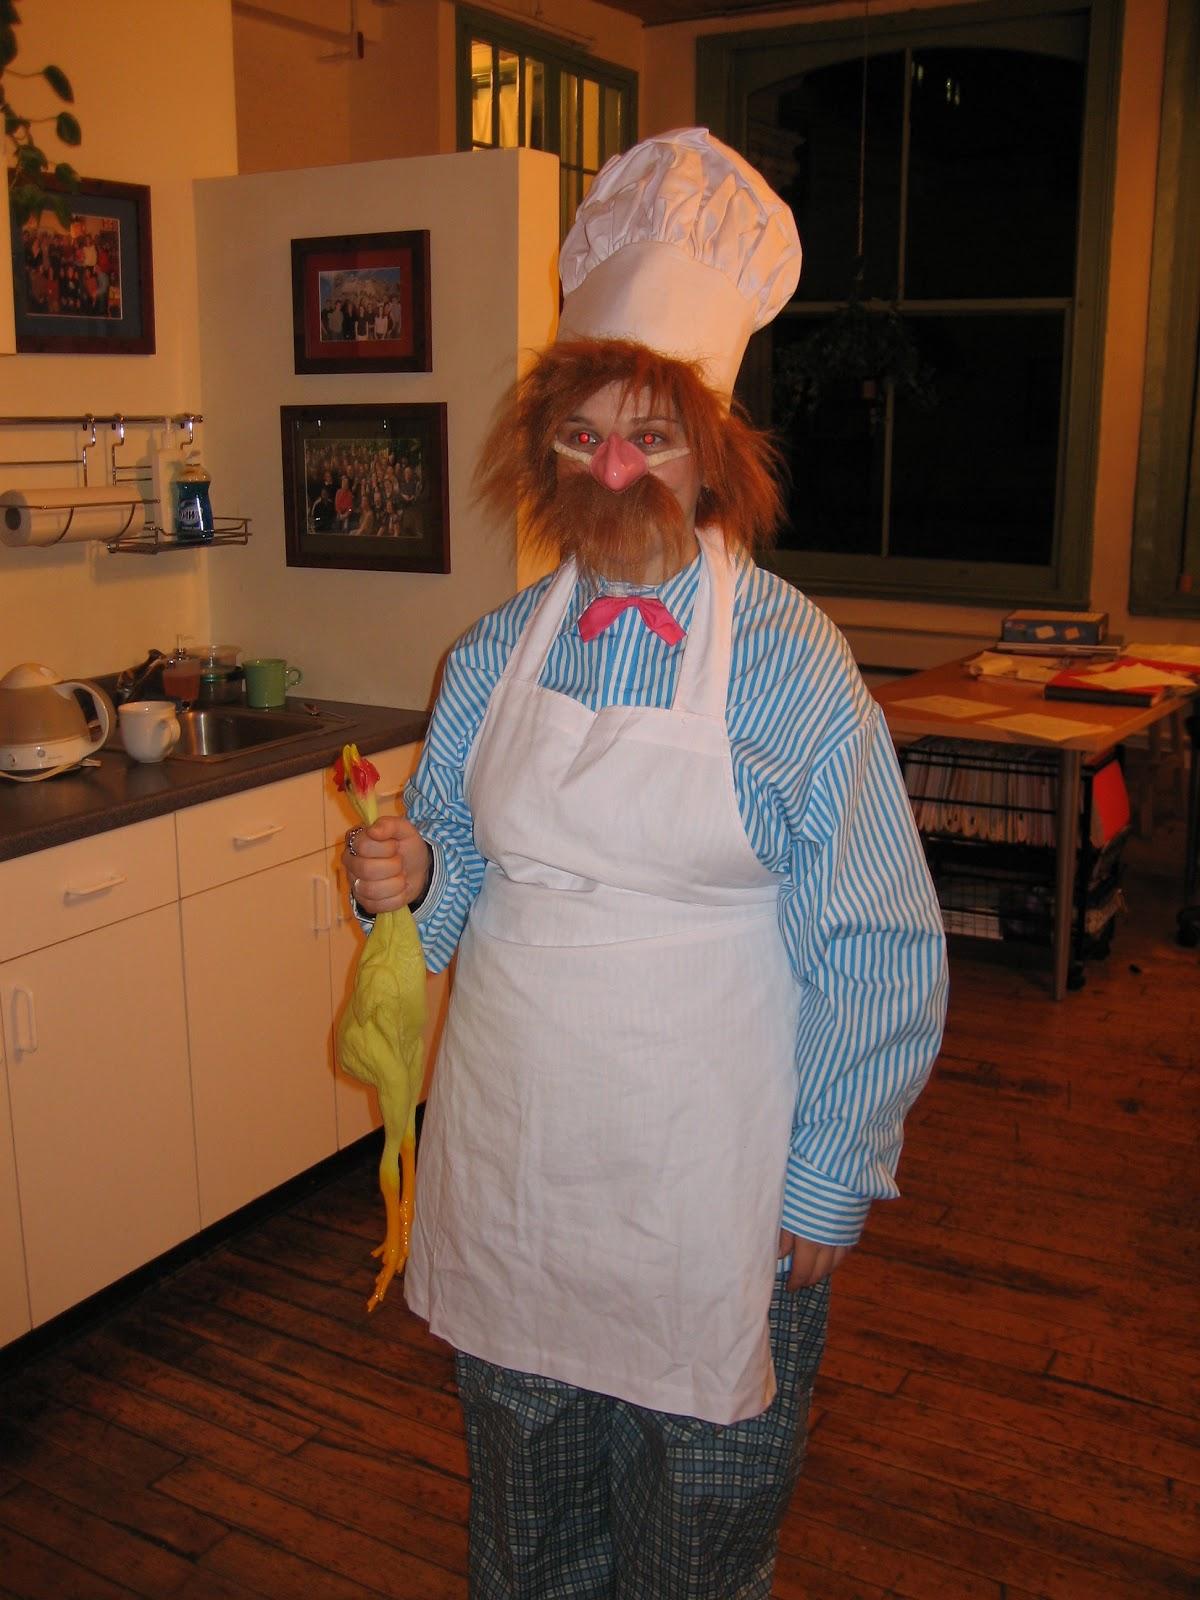 Chef Halloween Costume